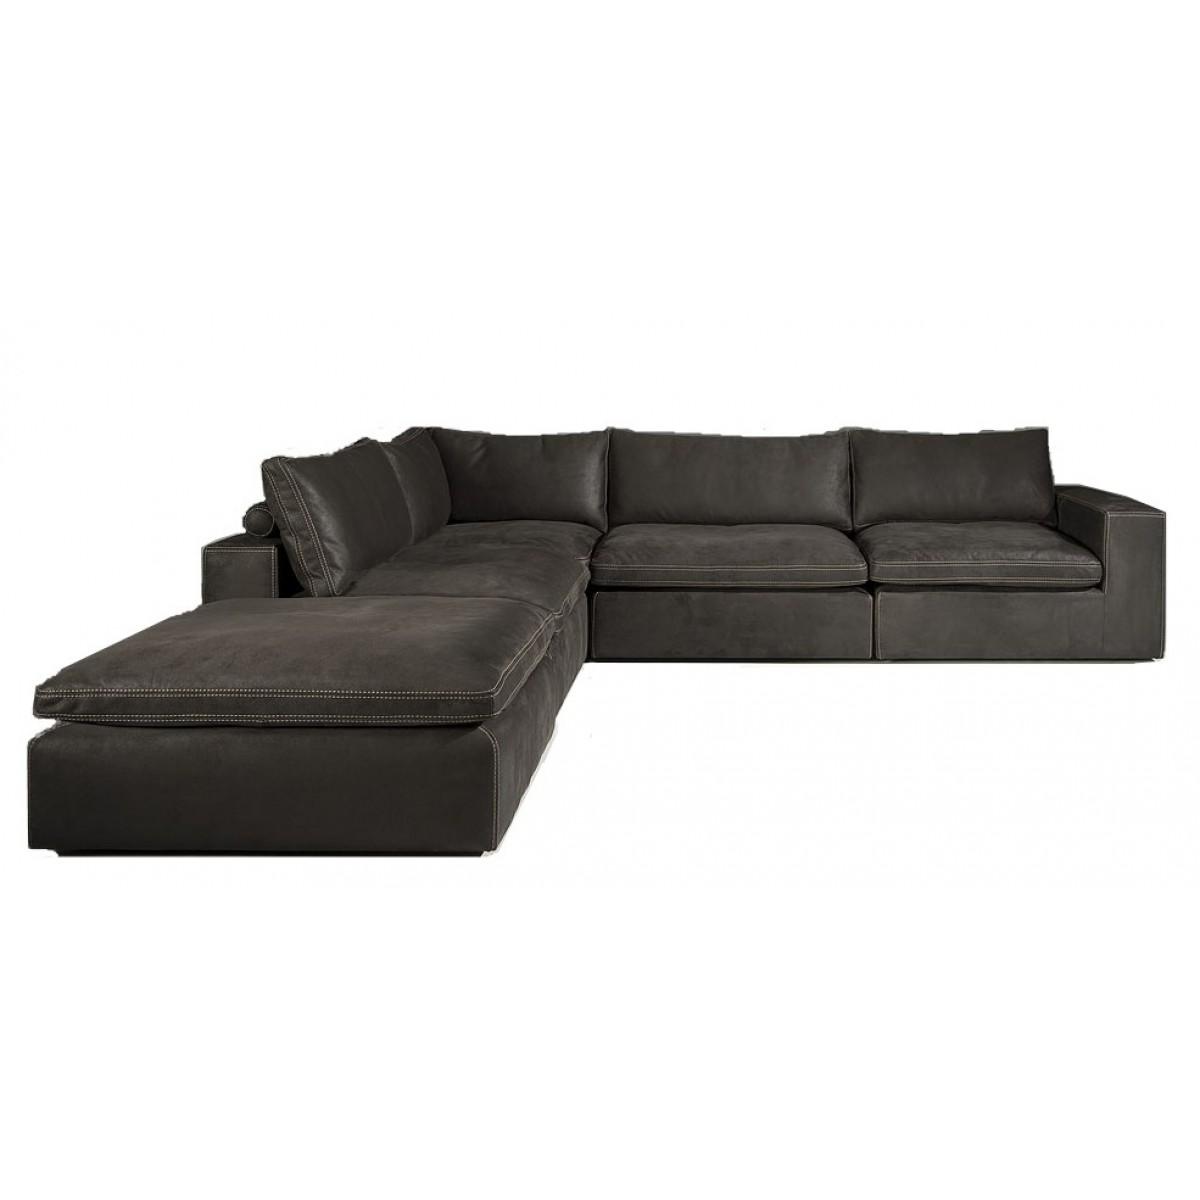 liknel-hoekbank-congo-leder-zwart-kontrast-stiksel